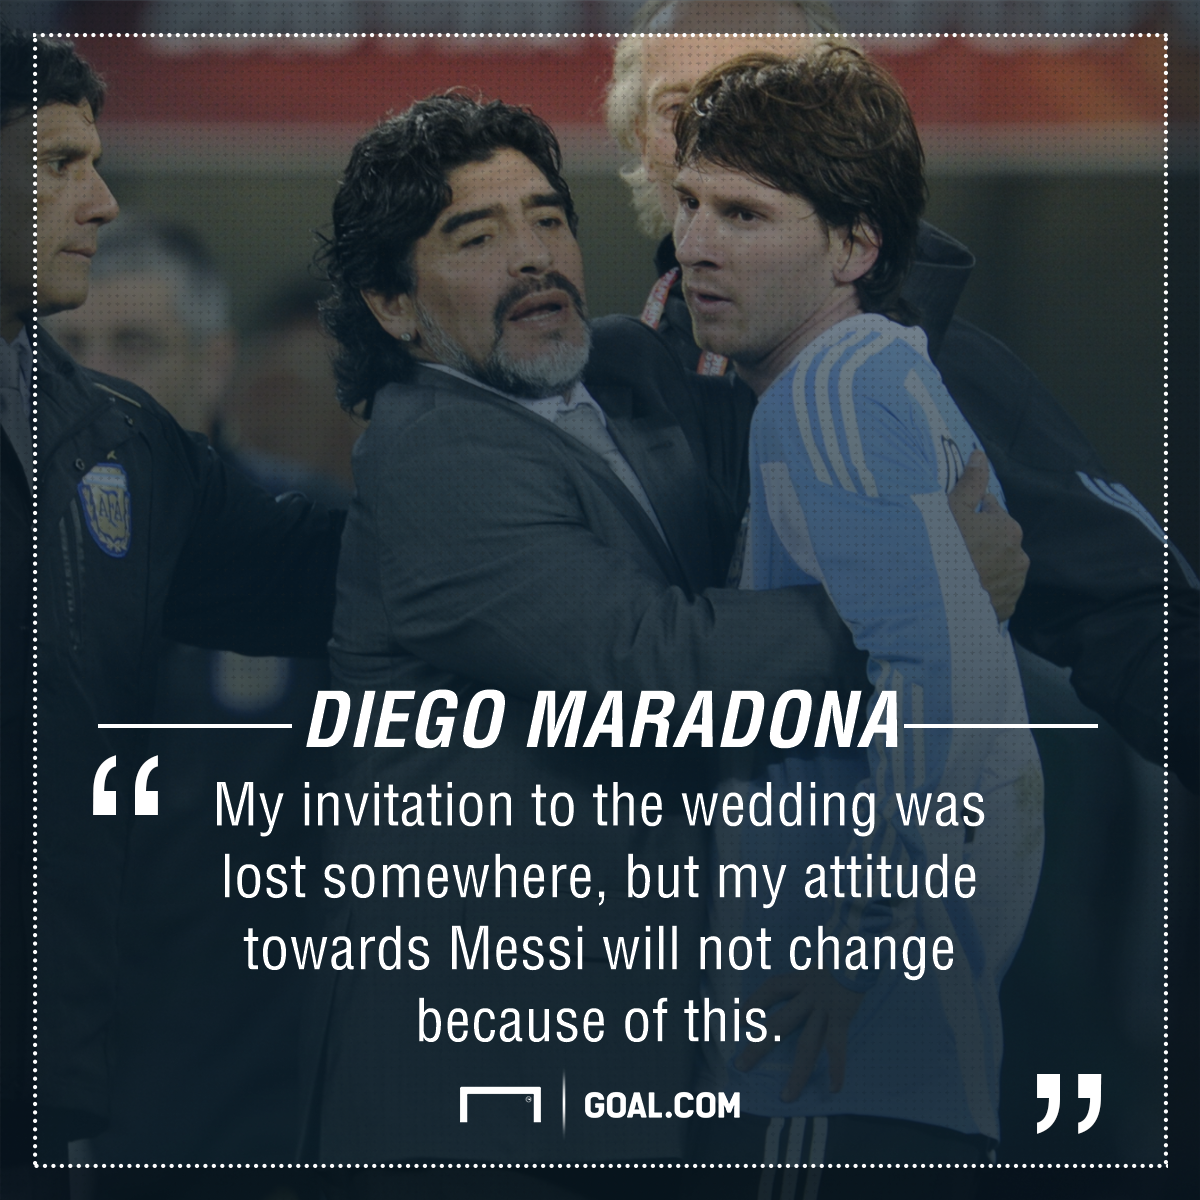 Diego Maradona Lionel Messi wedding